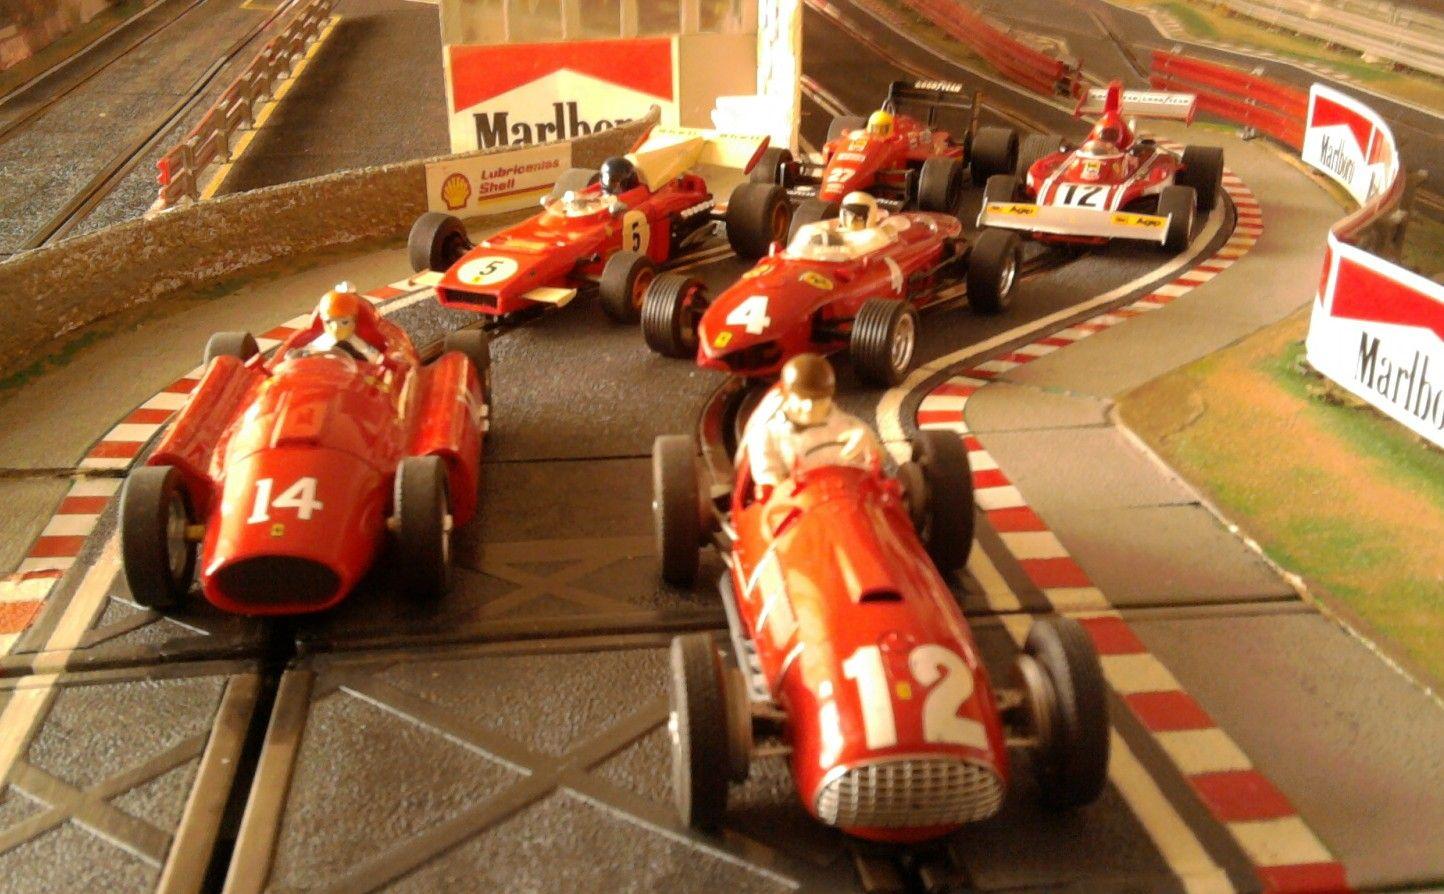 Mi Hobbie Favorito El Slot Una Gozada Disfrutar De La Conduccion De Estos Ferraris F1 Clasicos 375 F1 Lancia Fe Slot Cars Slot Car Racing Grand Prix Racing